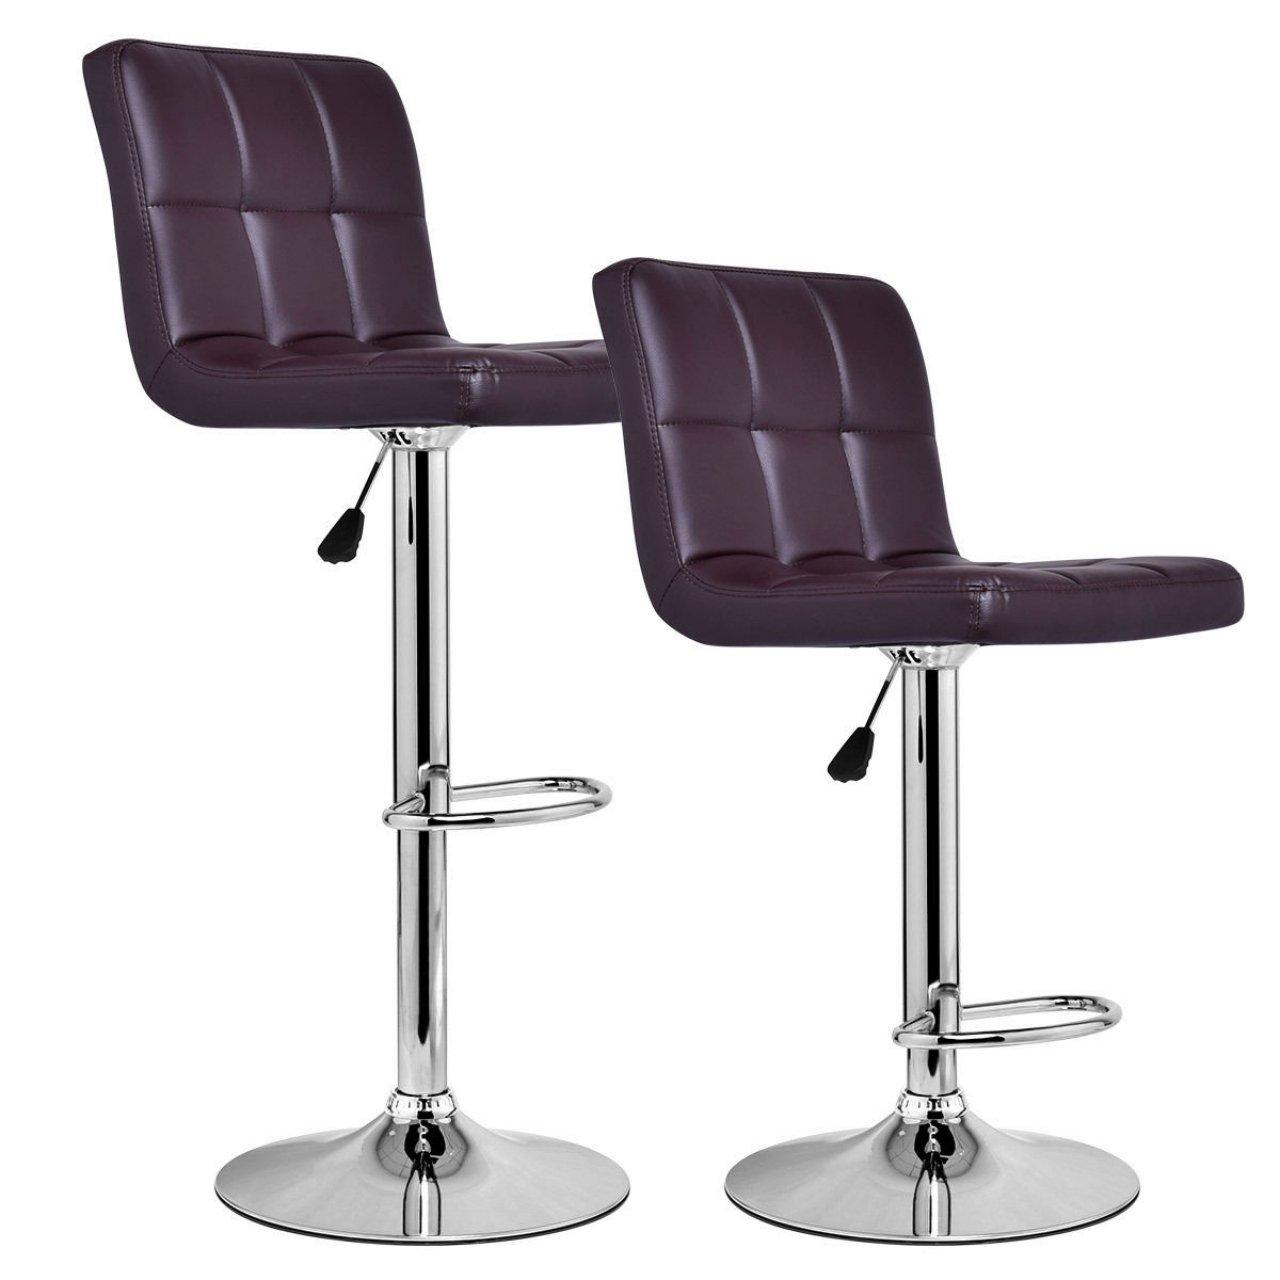 Set Of 2 Bar Stools Anti-aging PU Leather Adjustable Barstool 360 Degree Swivel Pub Style Comfortable Backrest/Brown #825